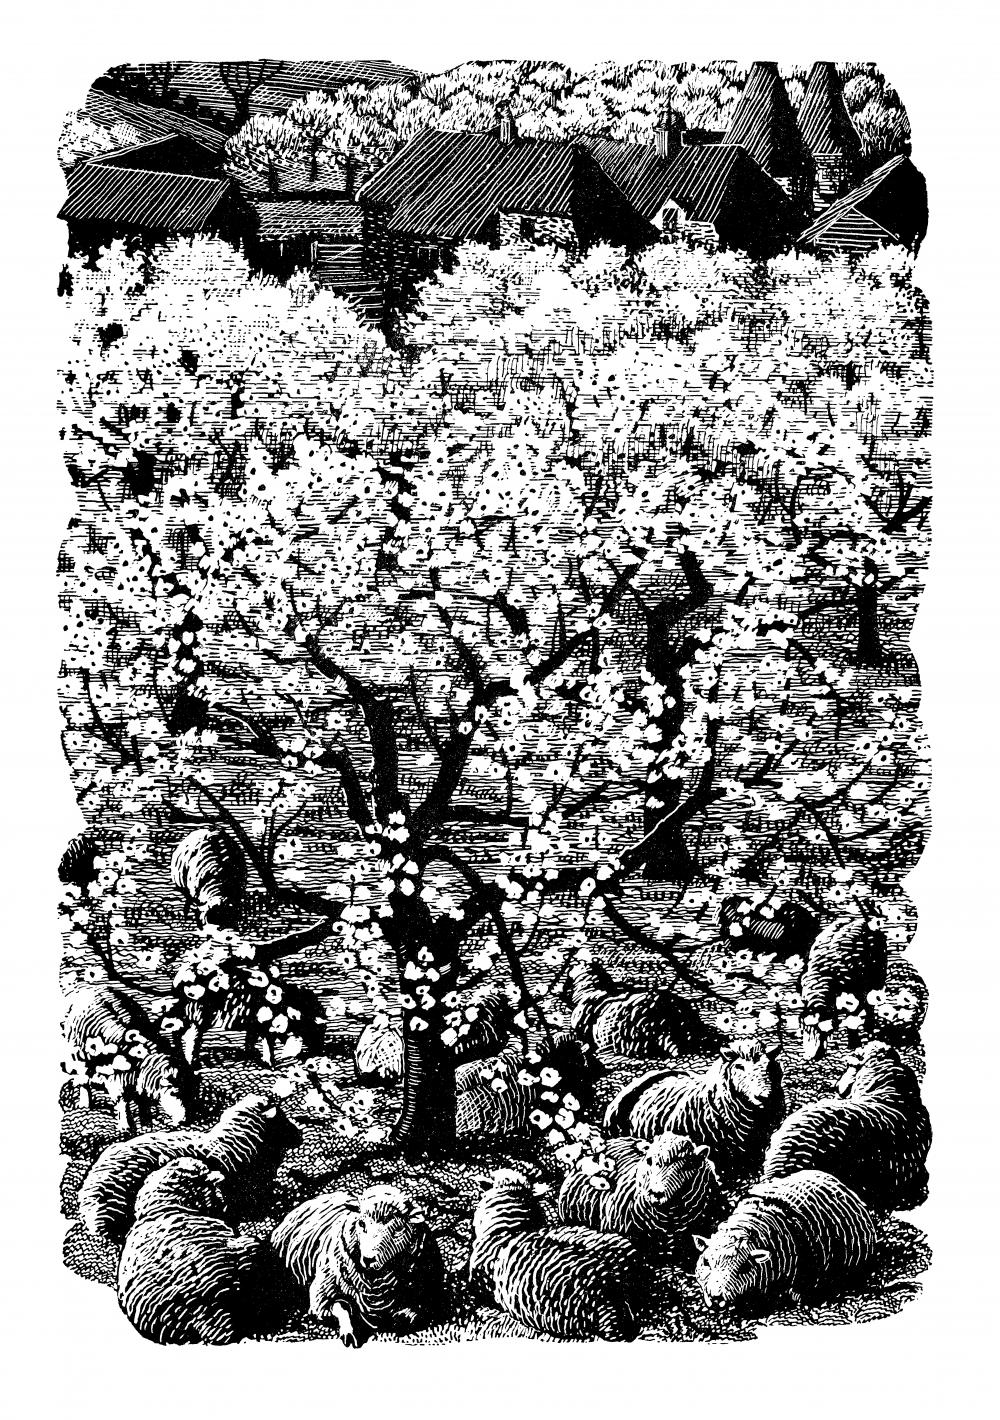 C F Tunnicliffe - The Cherry Tree